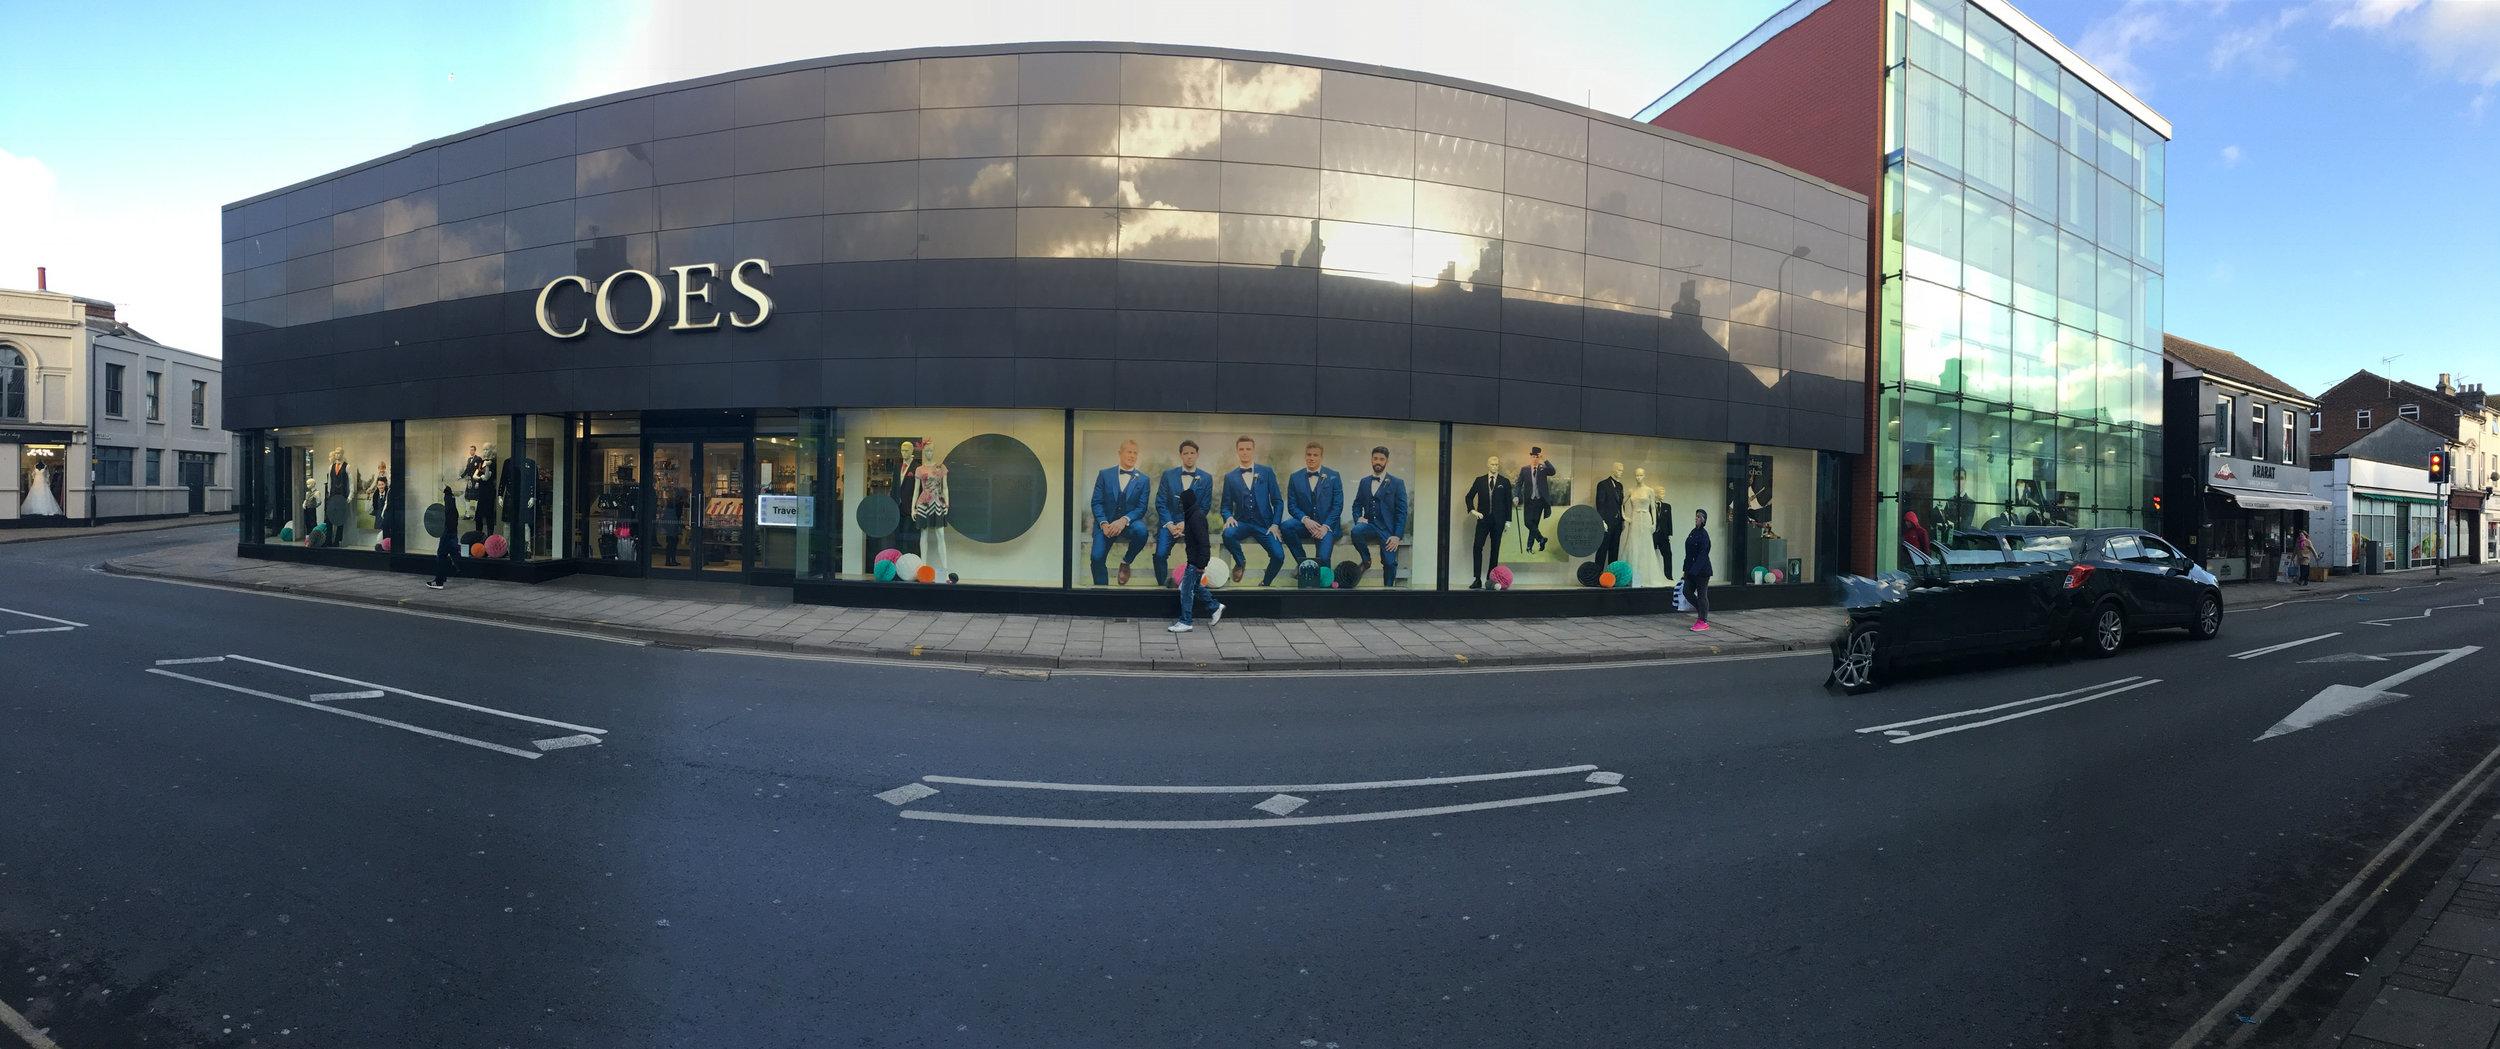 Coes Window display, Ipswich